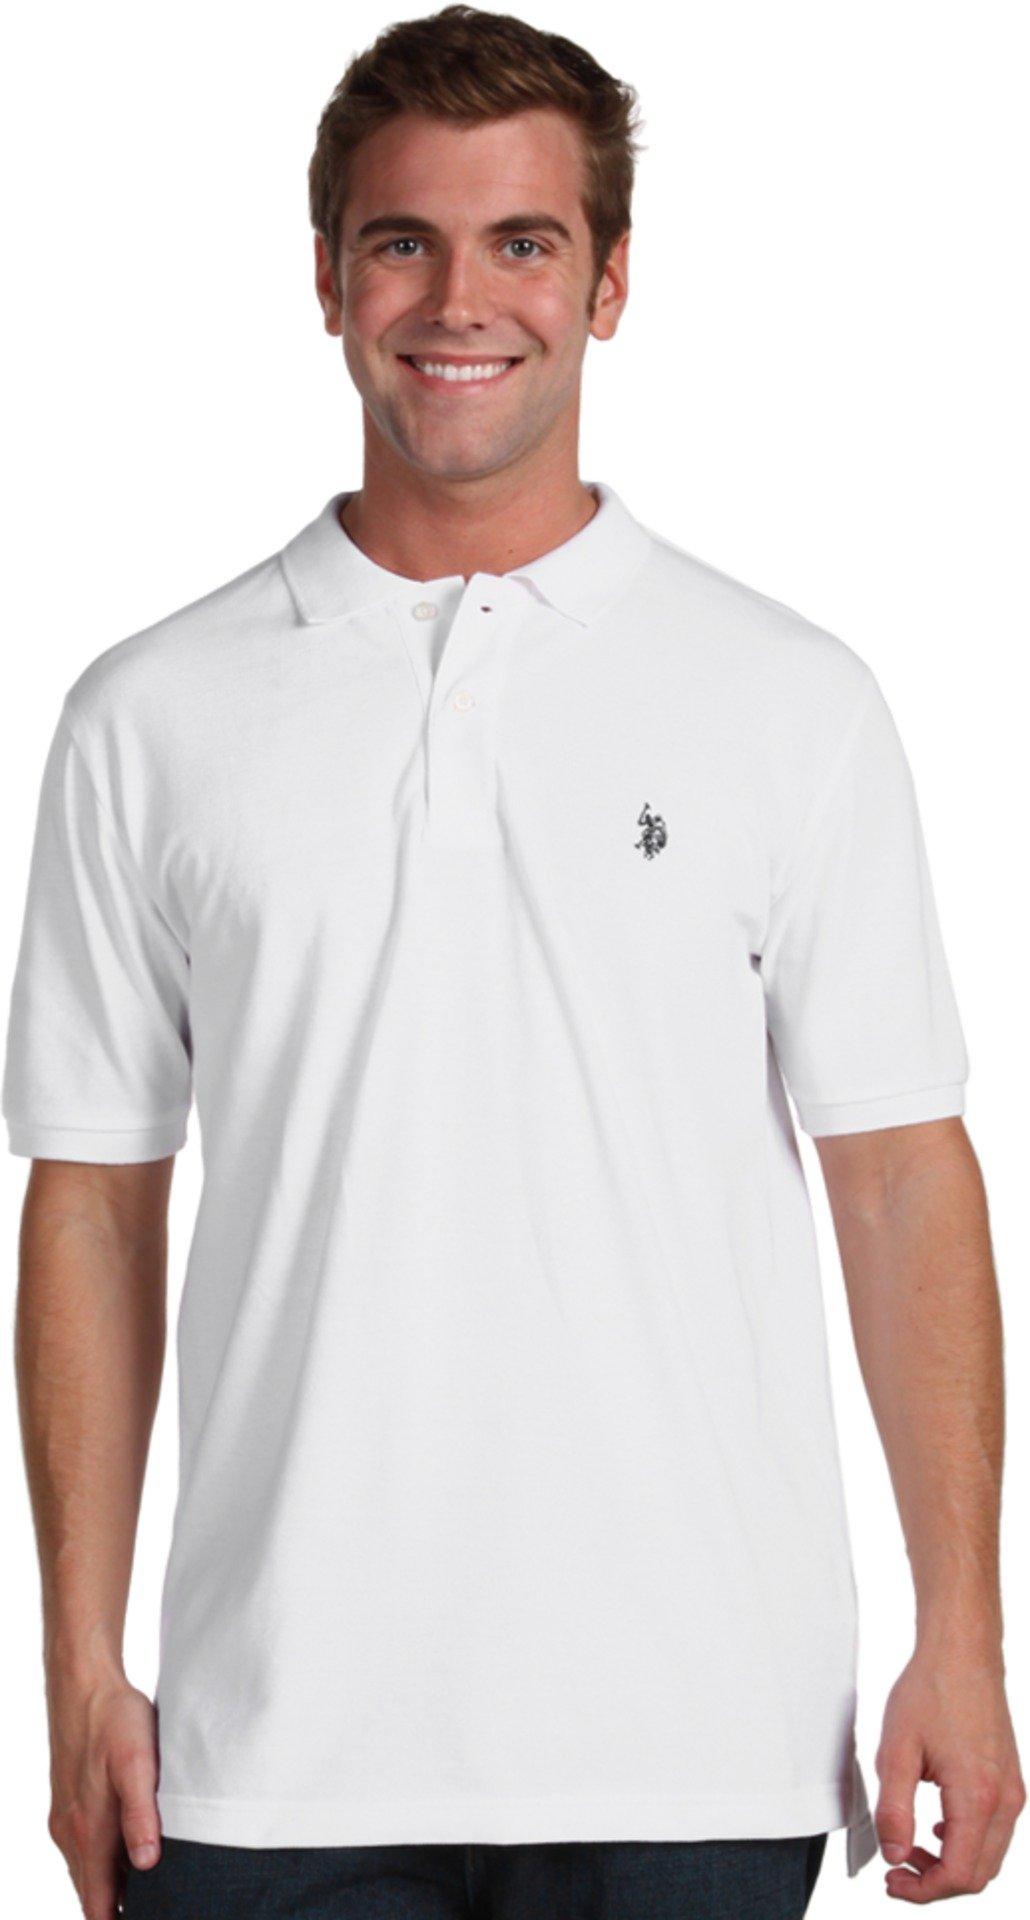 U.S. Polo Assn. Men's Classic Polo Shirt, White, XL